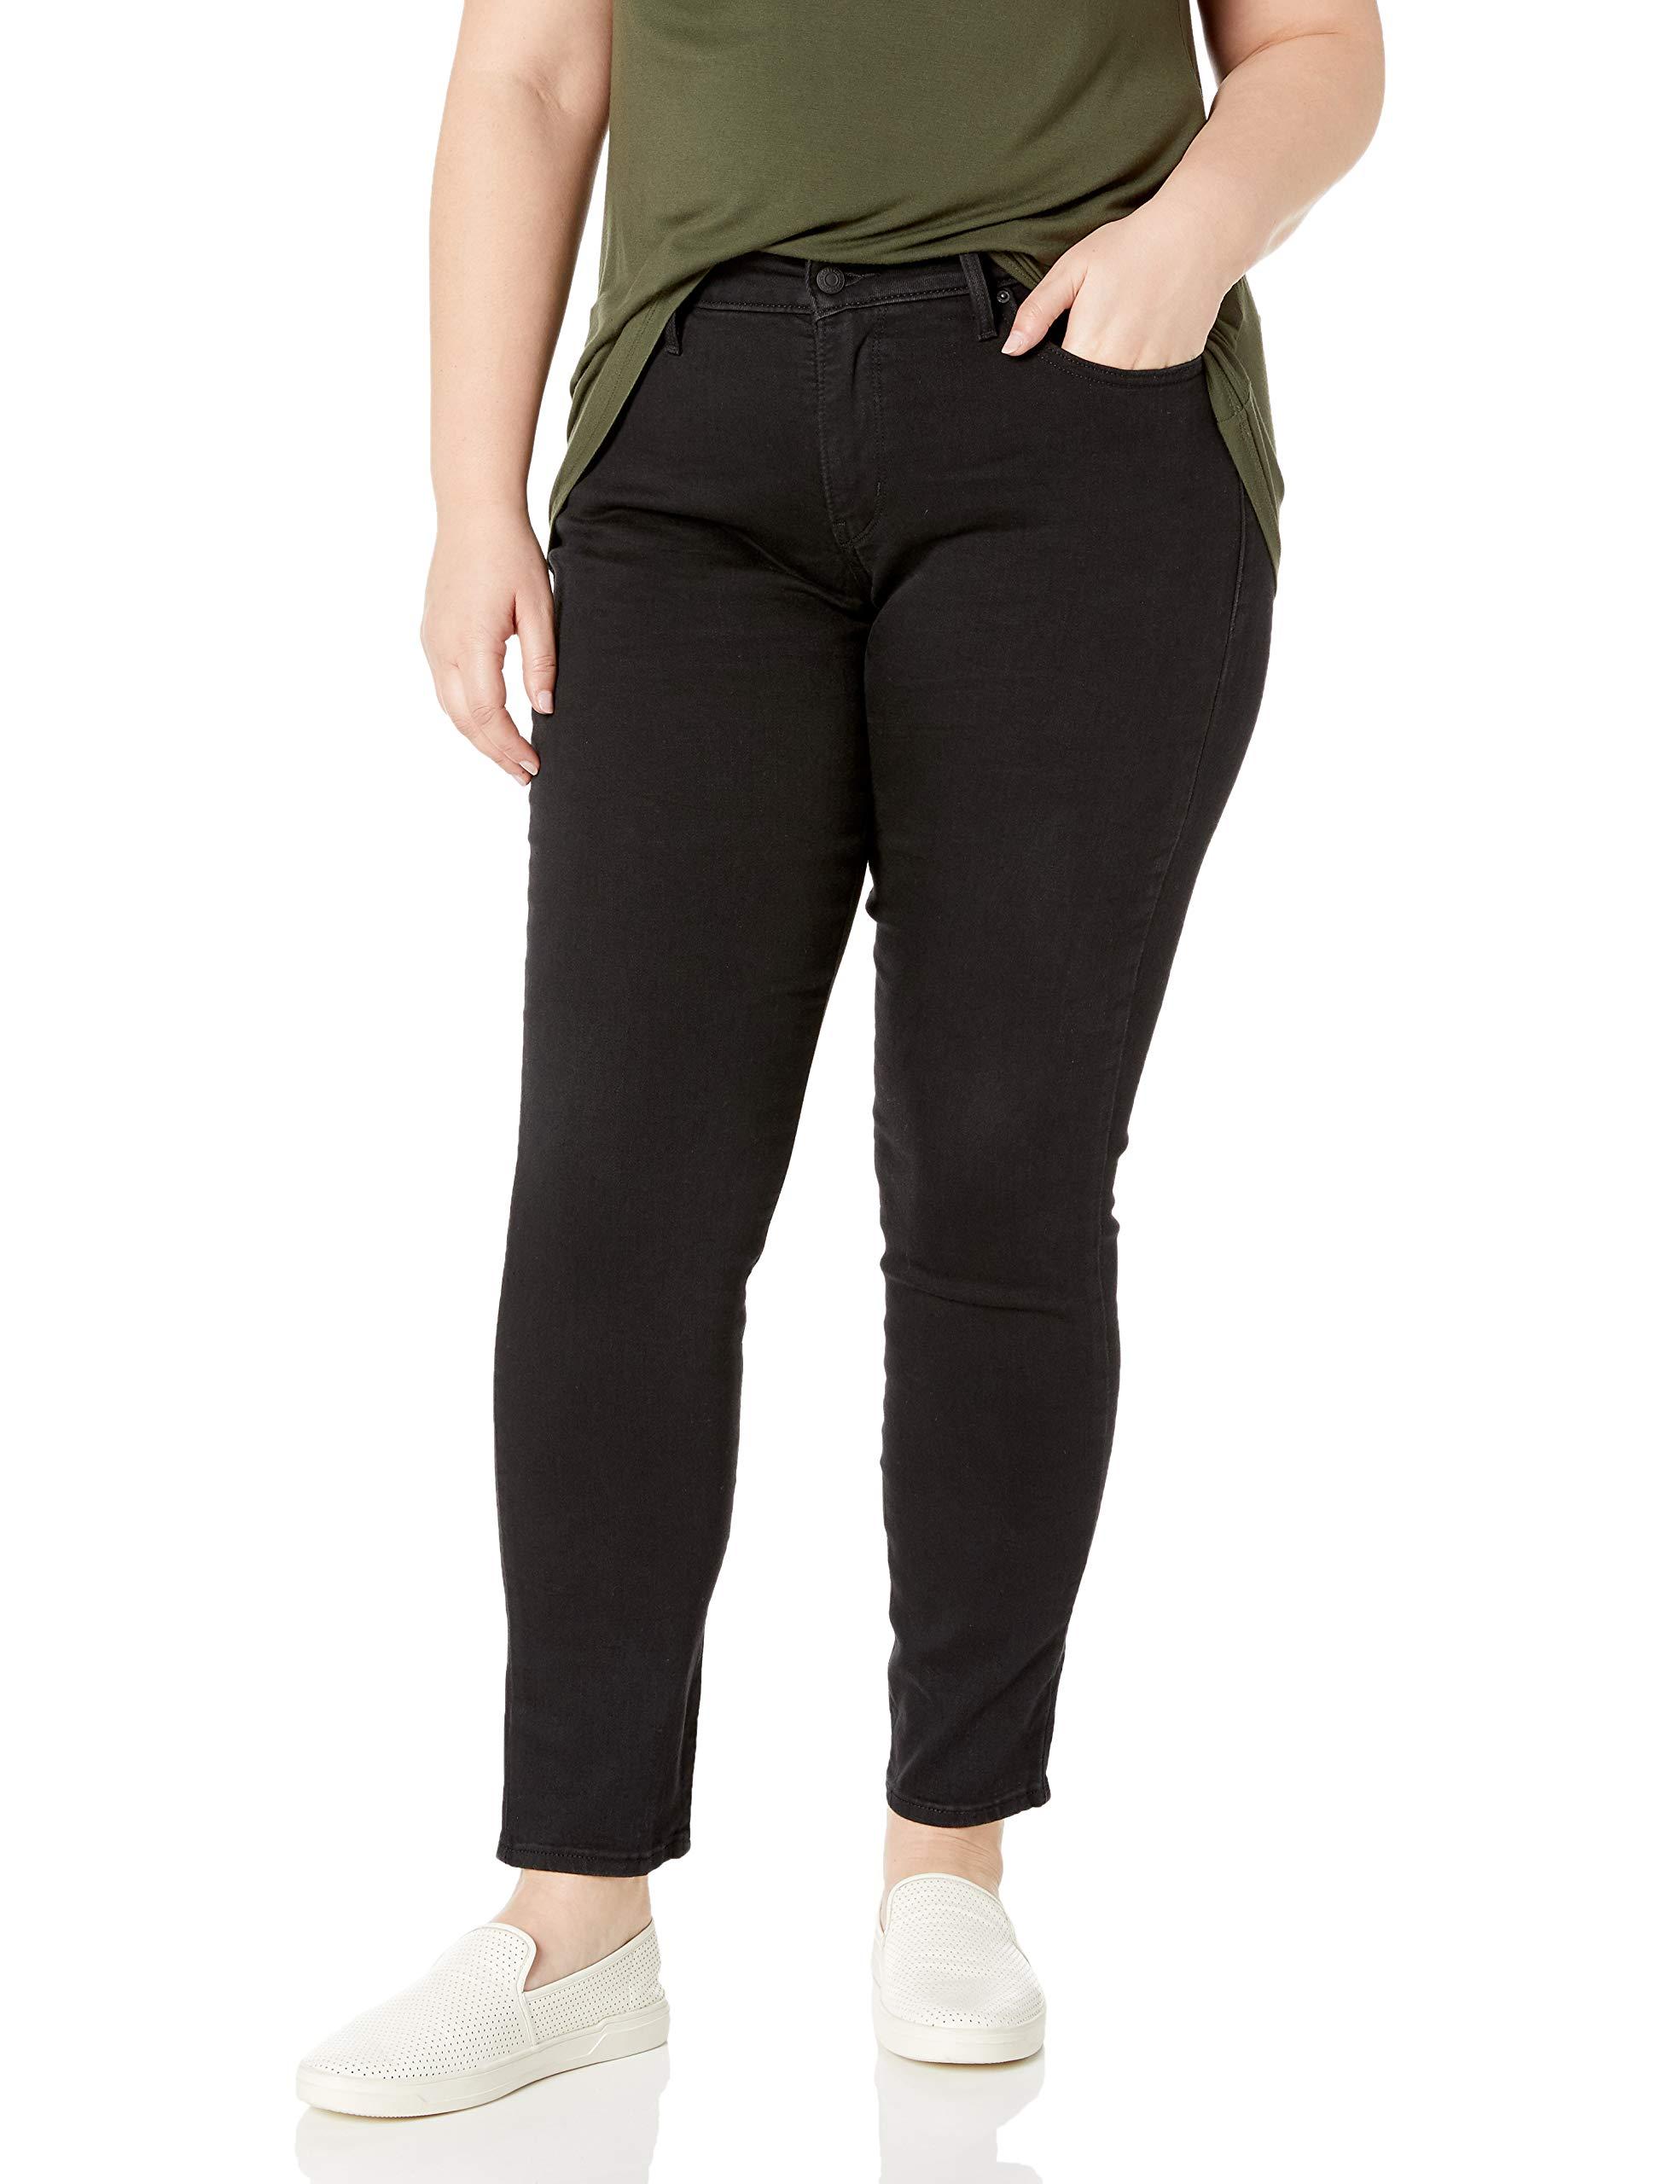 Levi's Women's Plus-Size 311 Plus Size Shaping